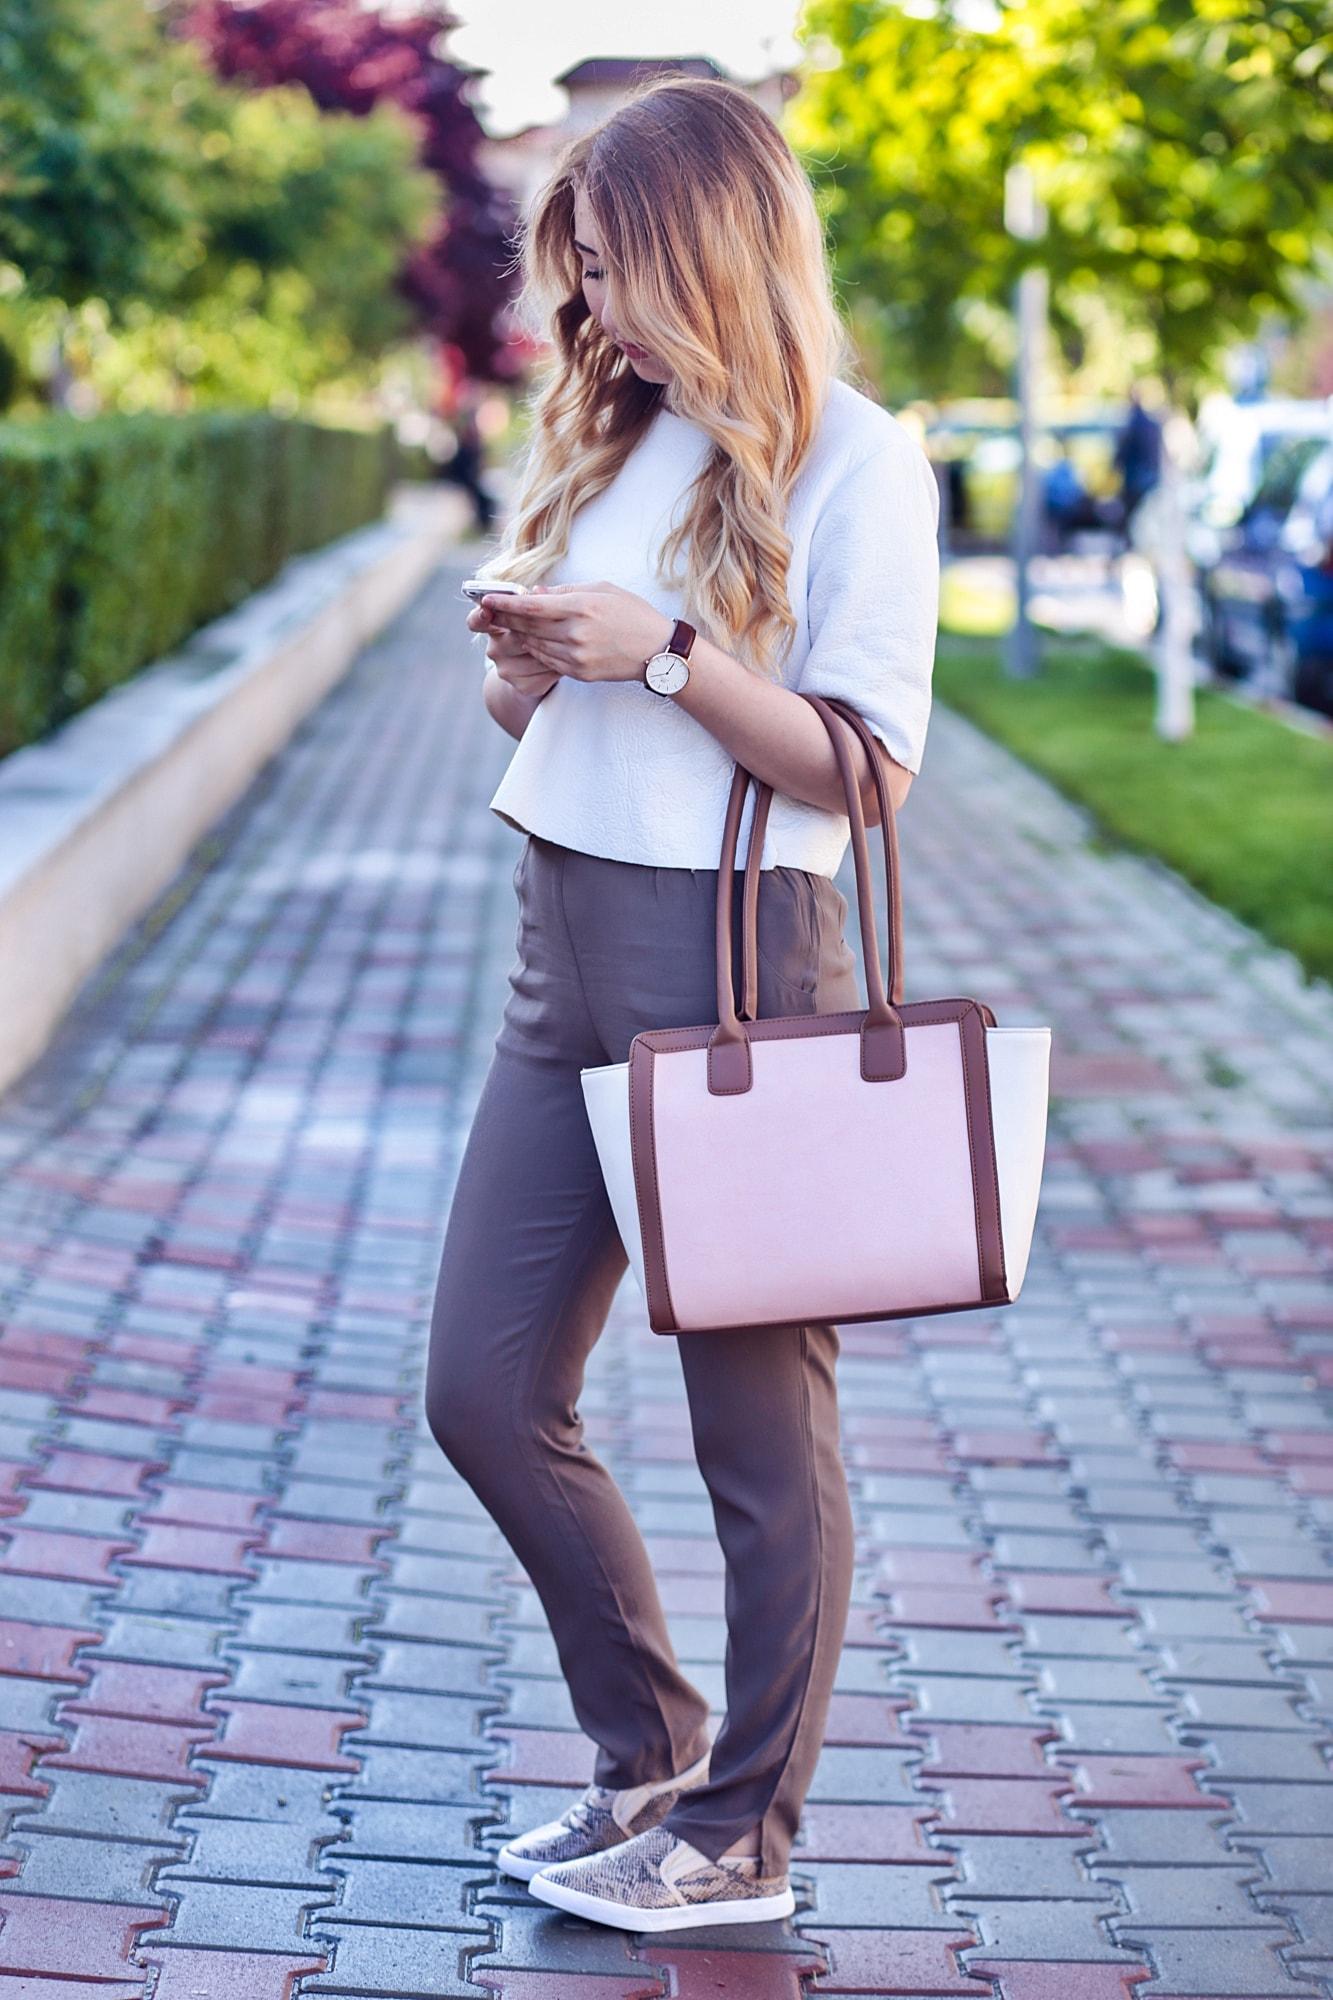 Tinuta casual chic, smart casual, primavara, bonprix, geanta trei culori, sneakersi, snake print, bluza neopren, kurtmann, ceas daniel wellington, fashion blogger, Andreea Ristea